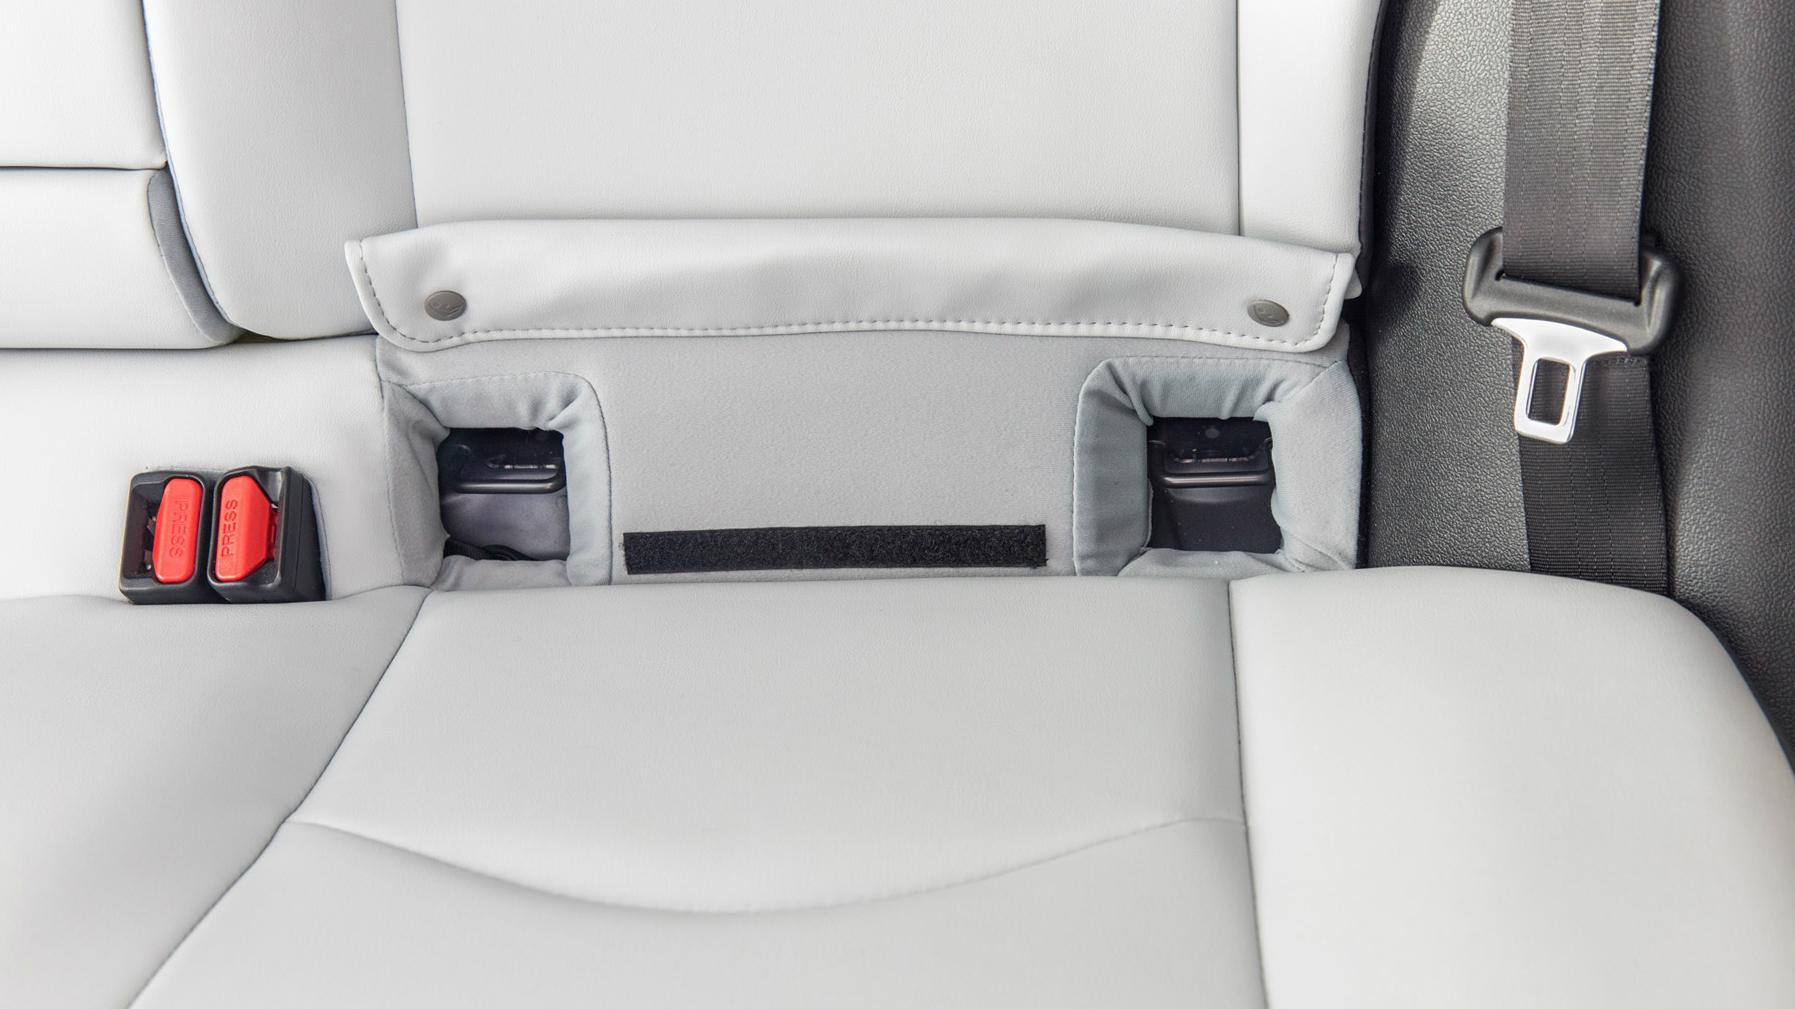 Toyota simpler child seat